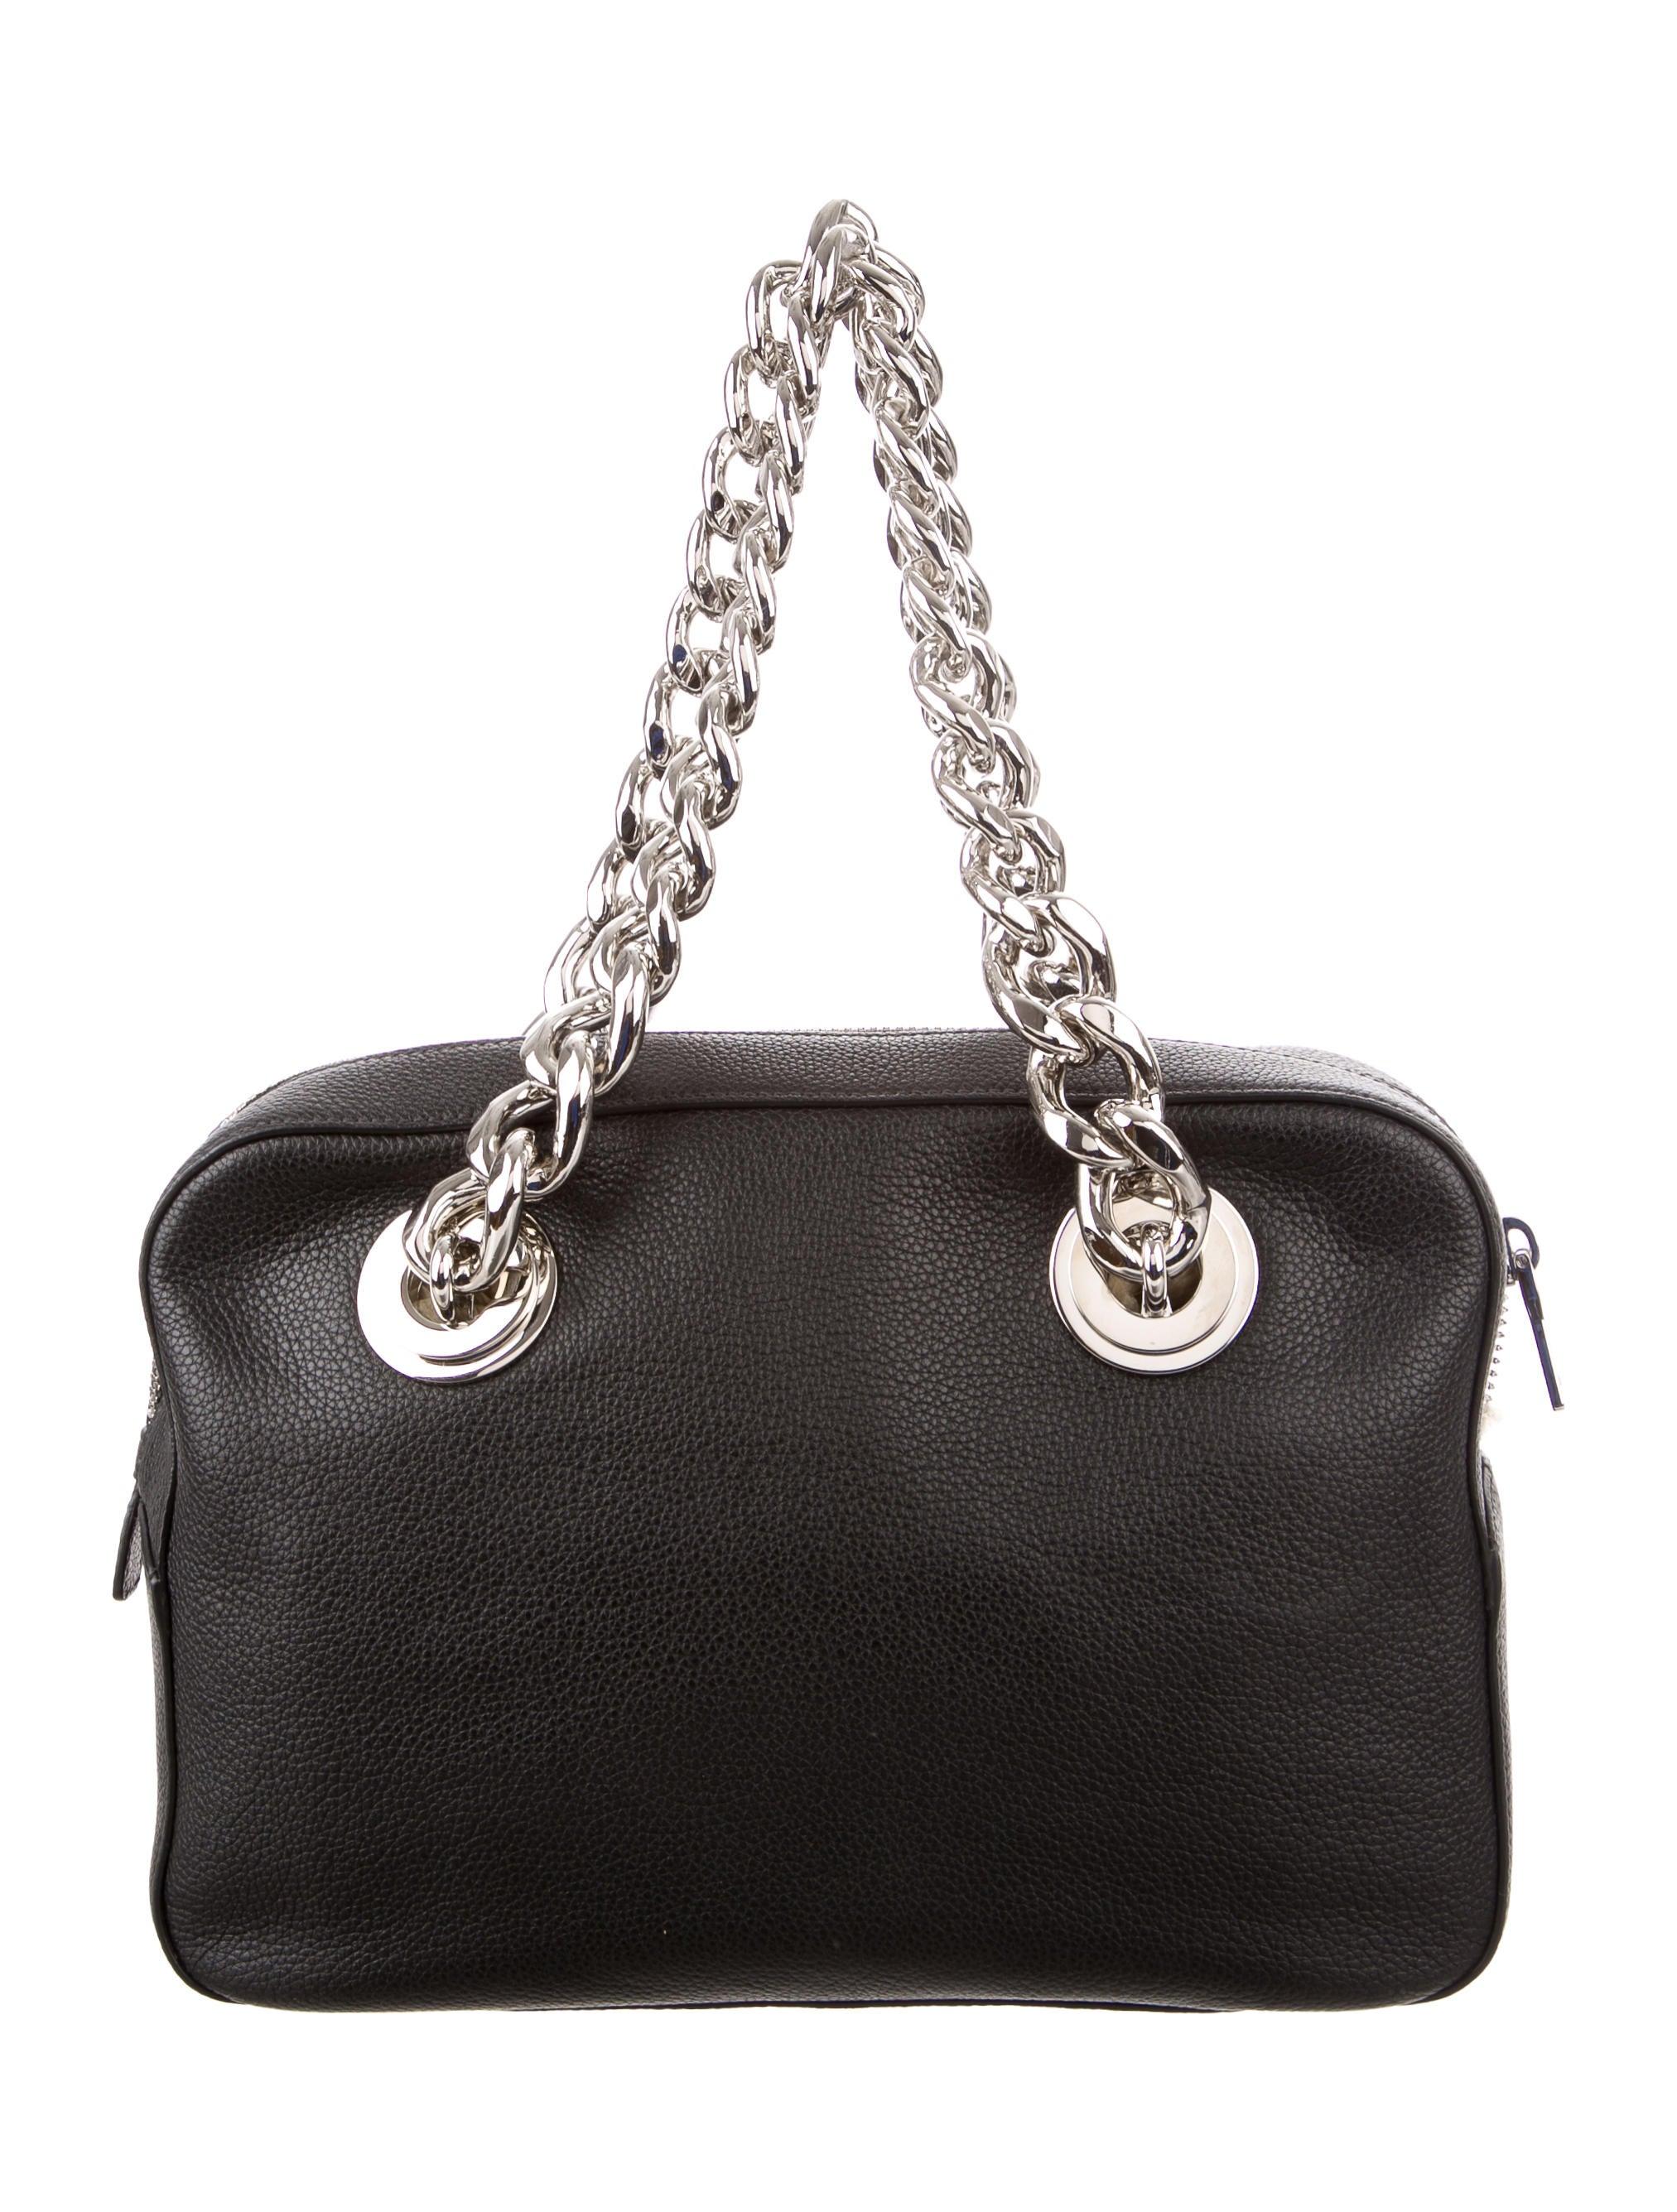 Prada 2016 Vitello Daino Bauletto Bag - Handbags - PRA136217  f47e5738b333a